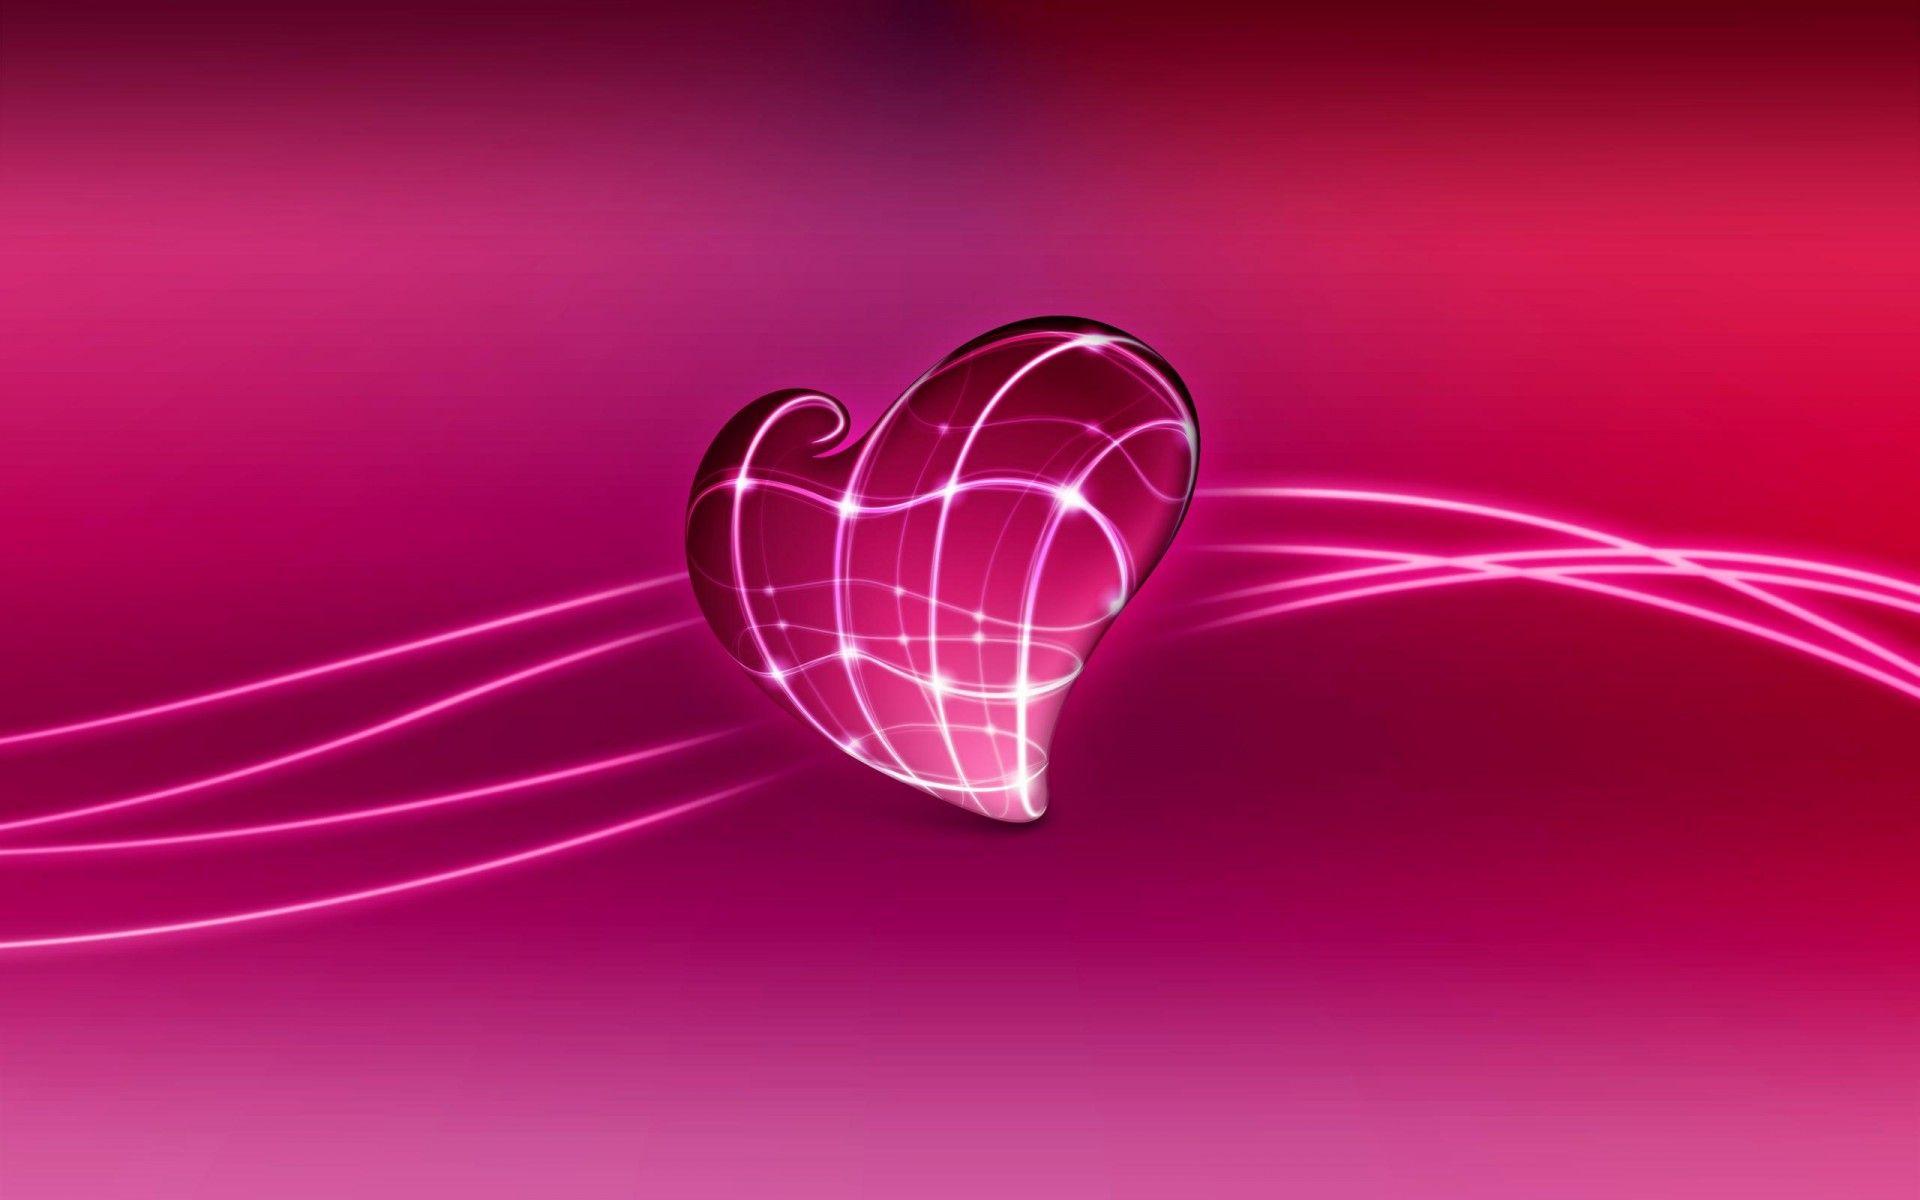 3d Love Heart Wallpapers Hartjes Behang Rozen Liefde